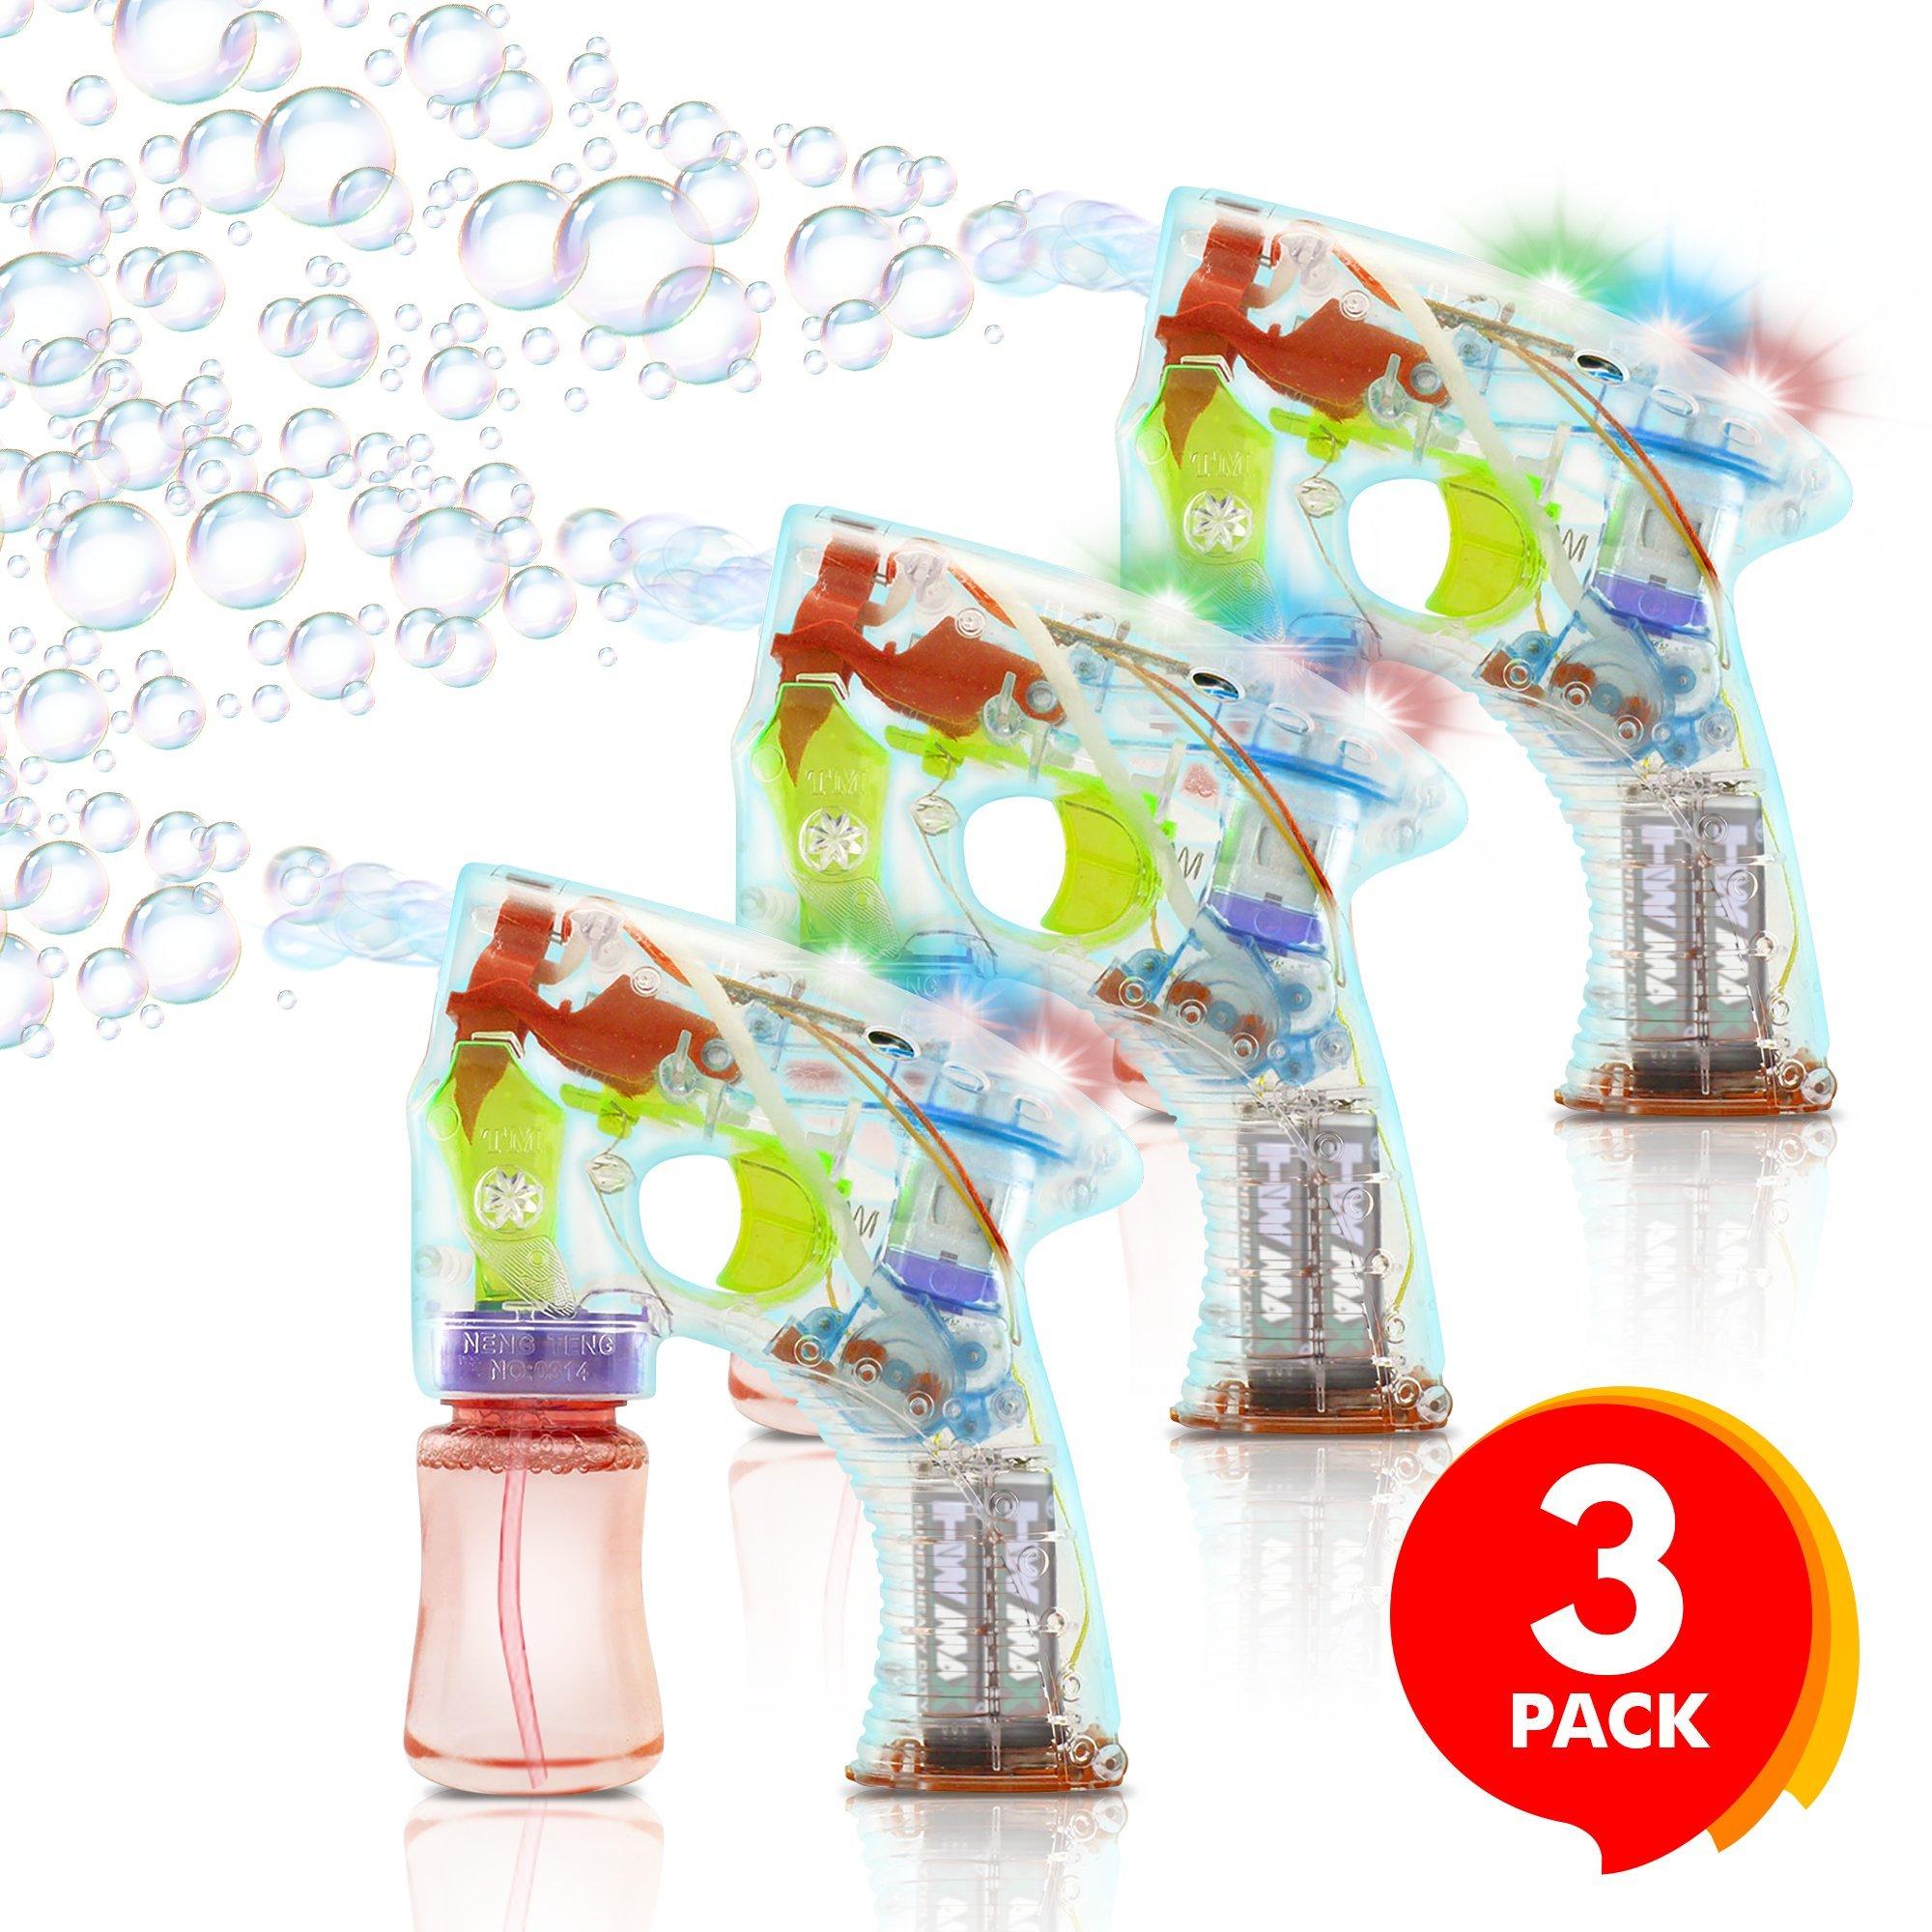 ArtCreativity Light up Bubble Gun (Set of 3) | Medium Lightweight Design | Perfect Summertime | Engaging Entertaining | Party Favor, Amazing Gift Idea Boys Girls (Batteries Included)